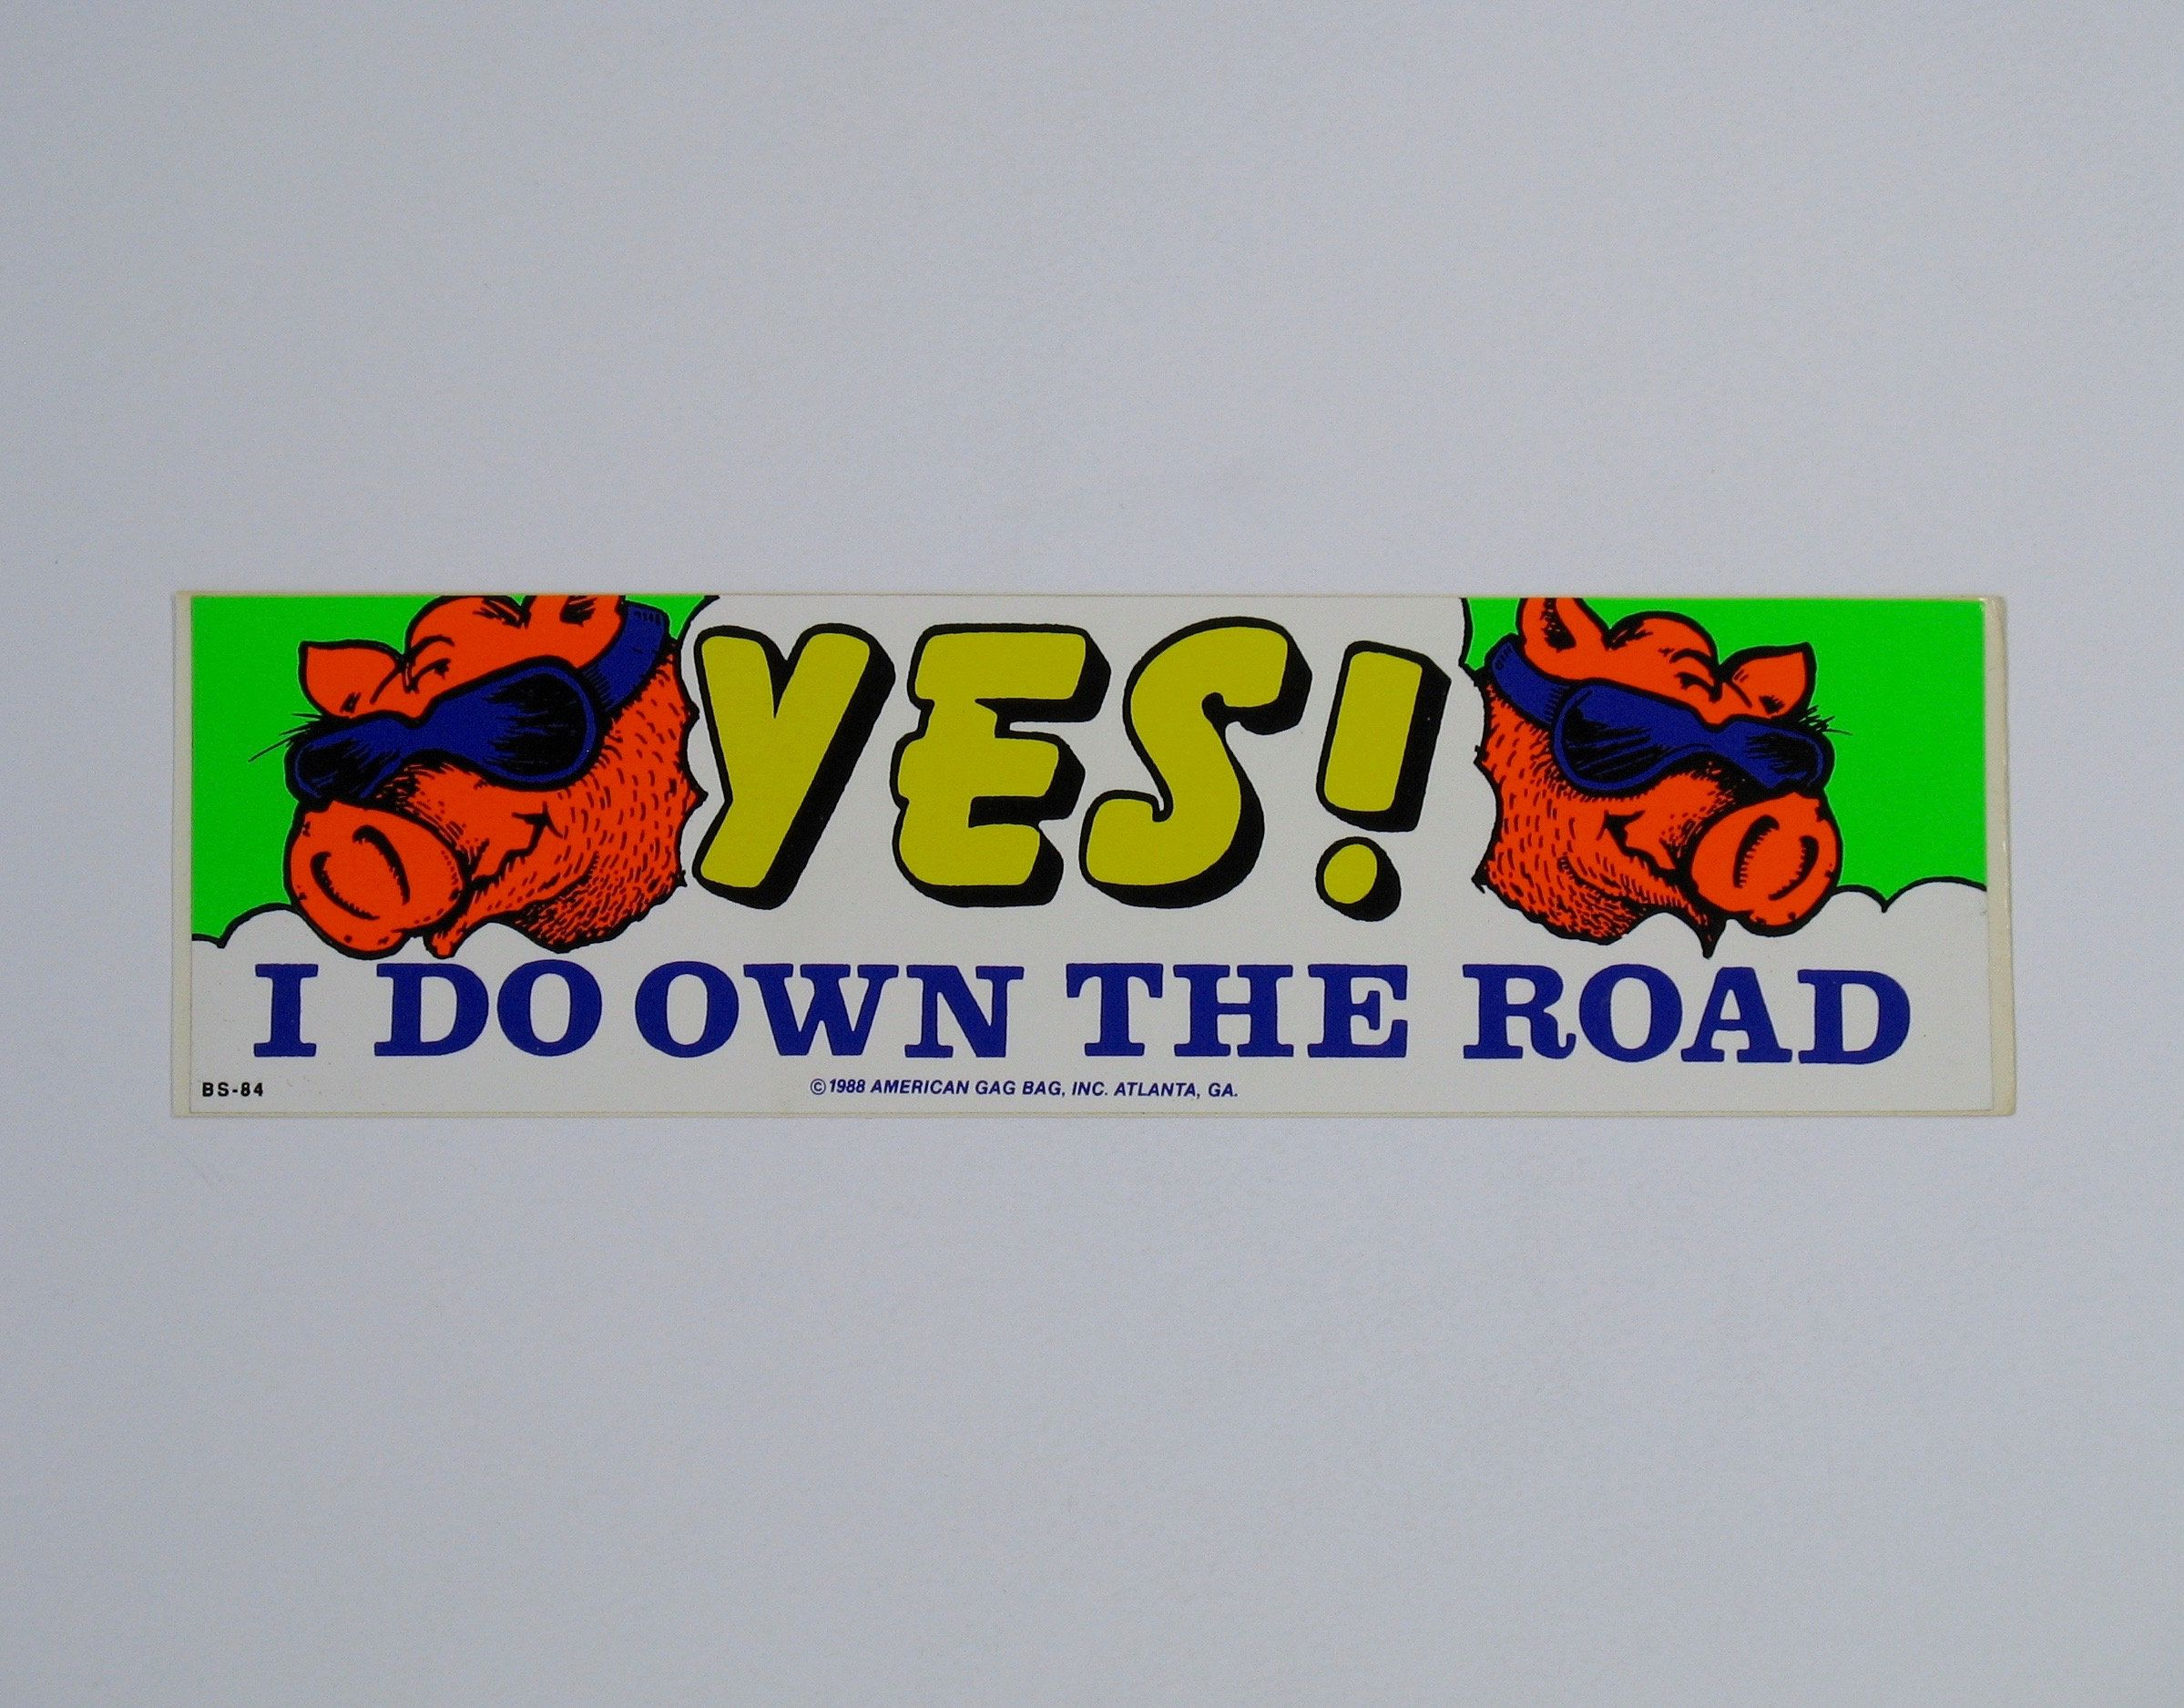 Vintage Bumper Sticker Decal Road Hog Neon Bright Color Funny Humor Car Camper Van Joke Gift 80s Biker Truck Driver Gearhead Pig Bumper Stickers Bumpers Stickers [ 1875 x 2398 Pixel ]